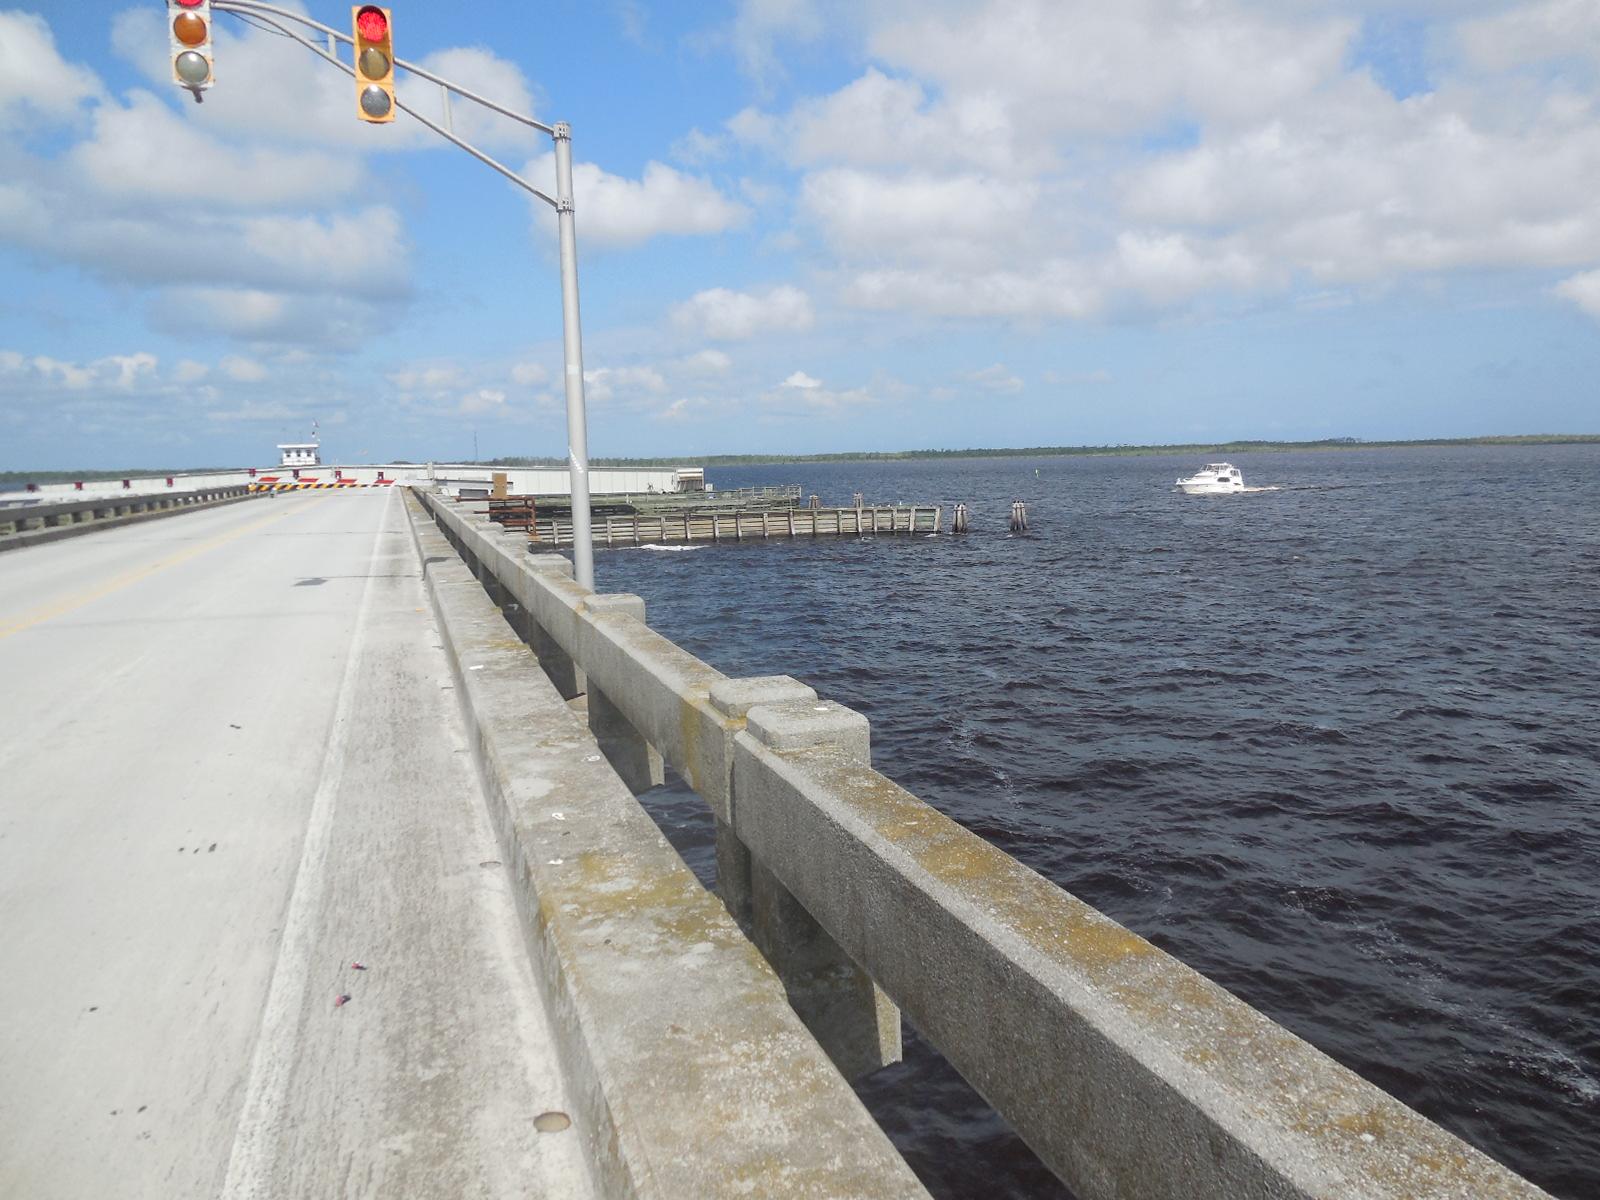 Marine Operator Renews Port Everglades Lease Haul Produce